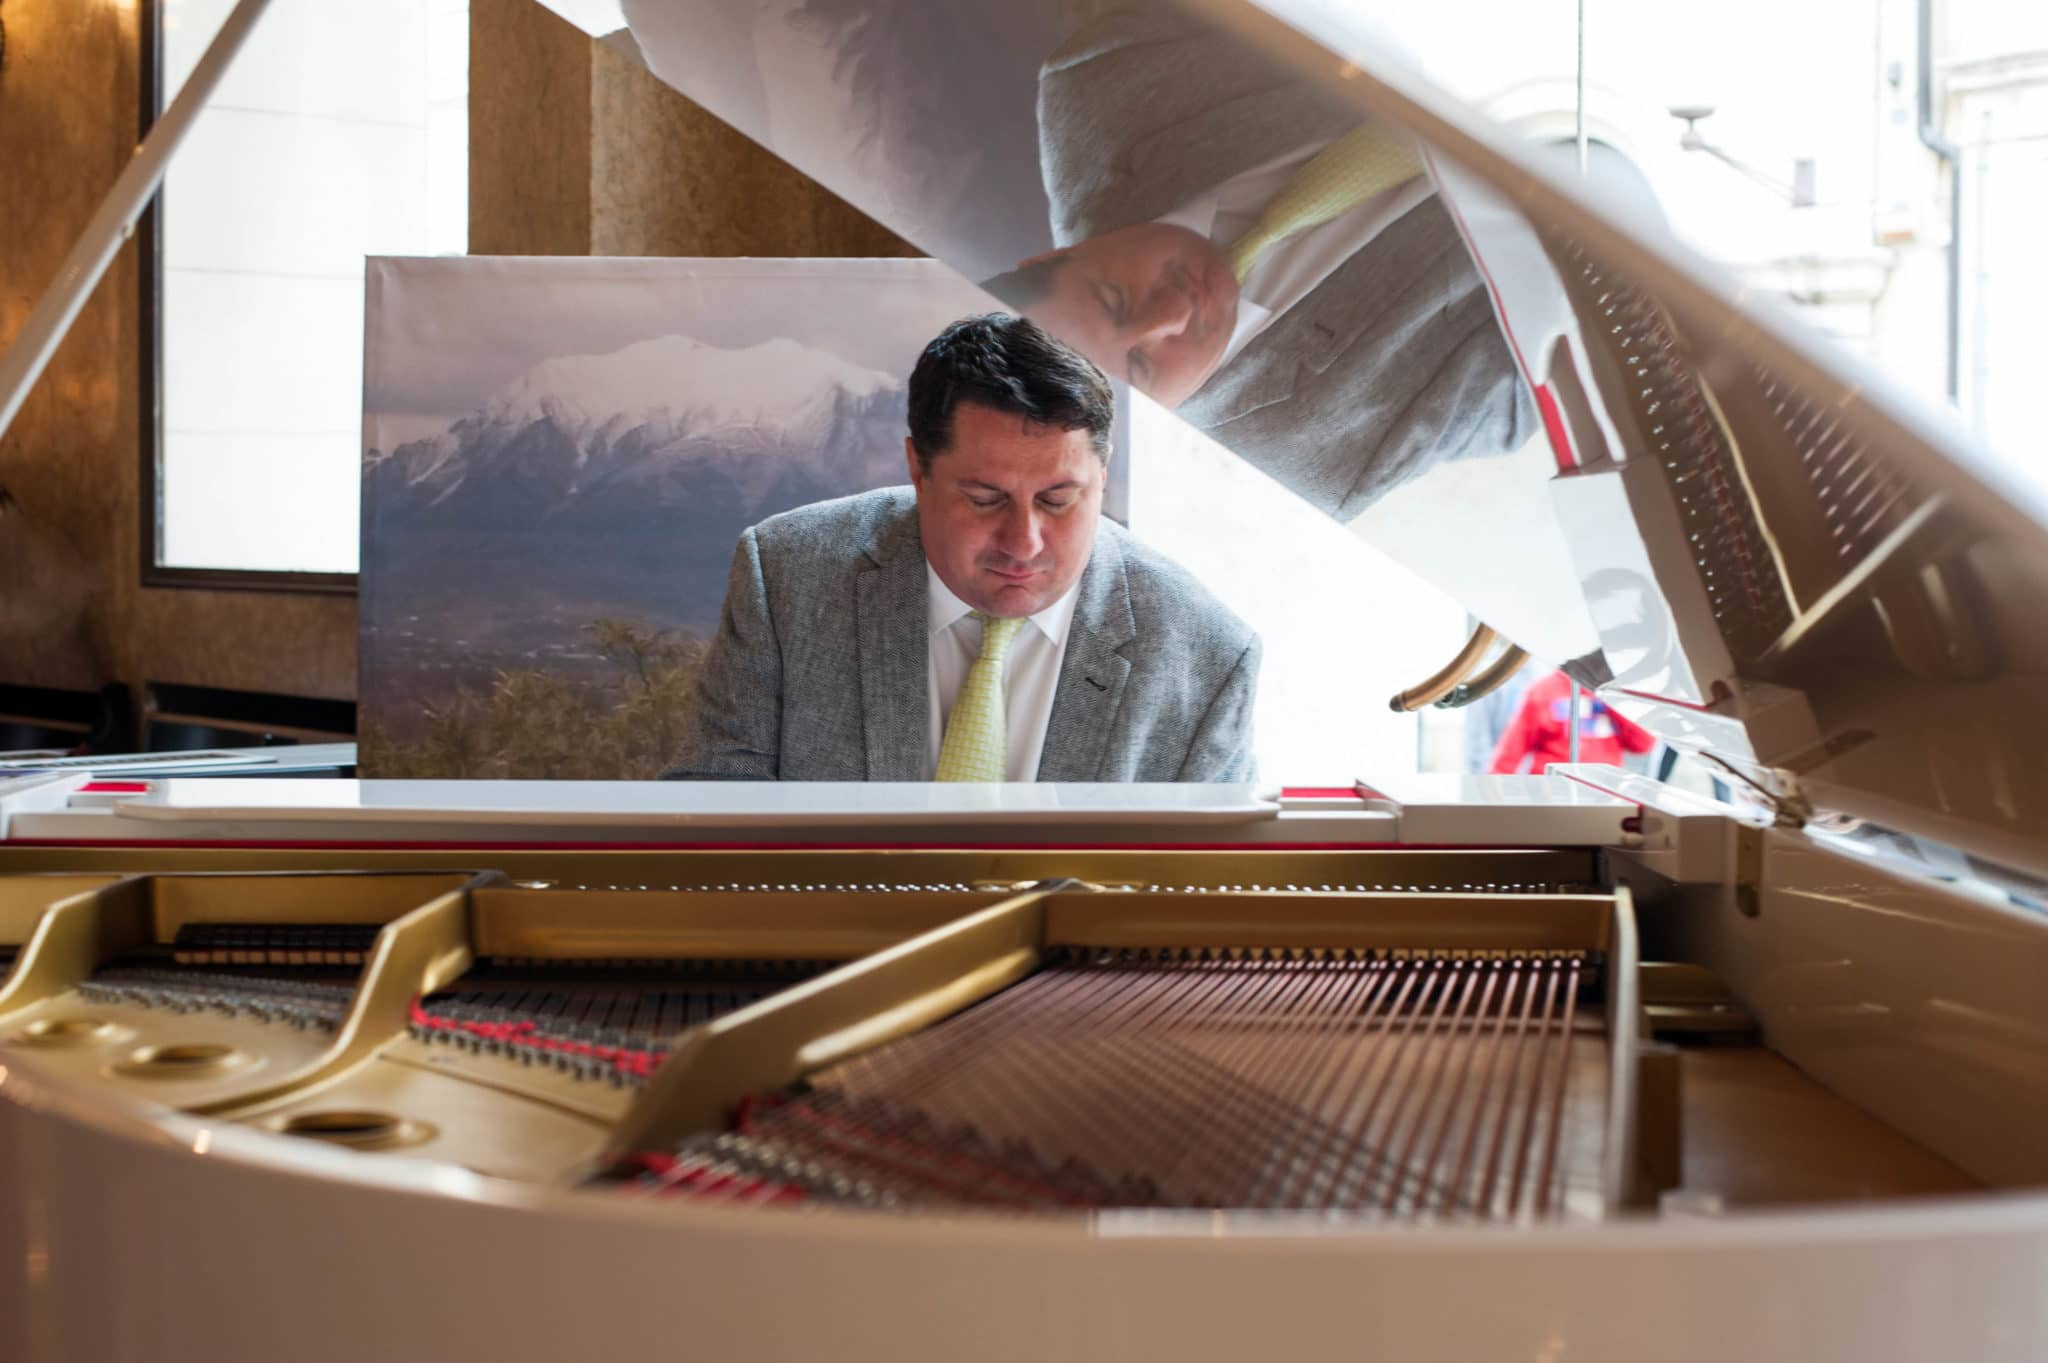 Pianist im Caffè Pedrocchi